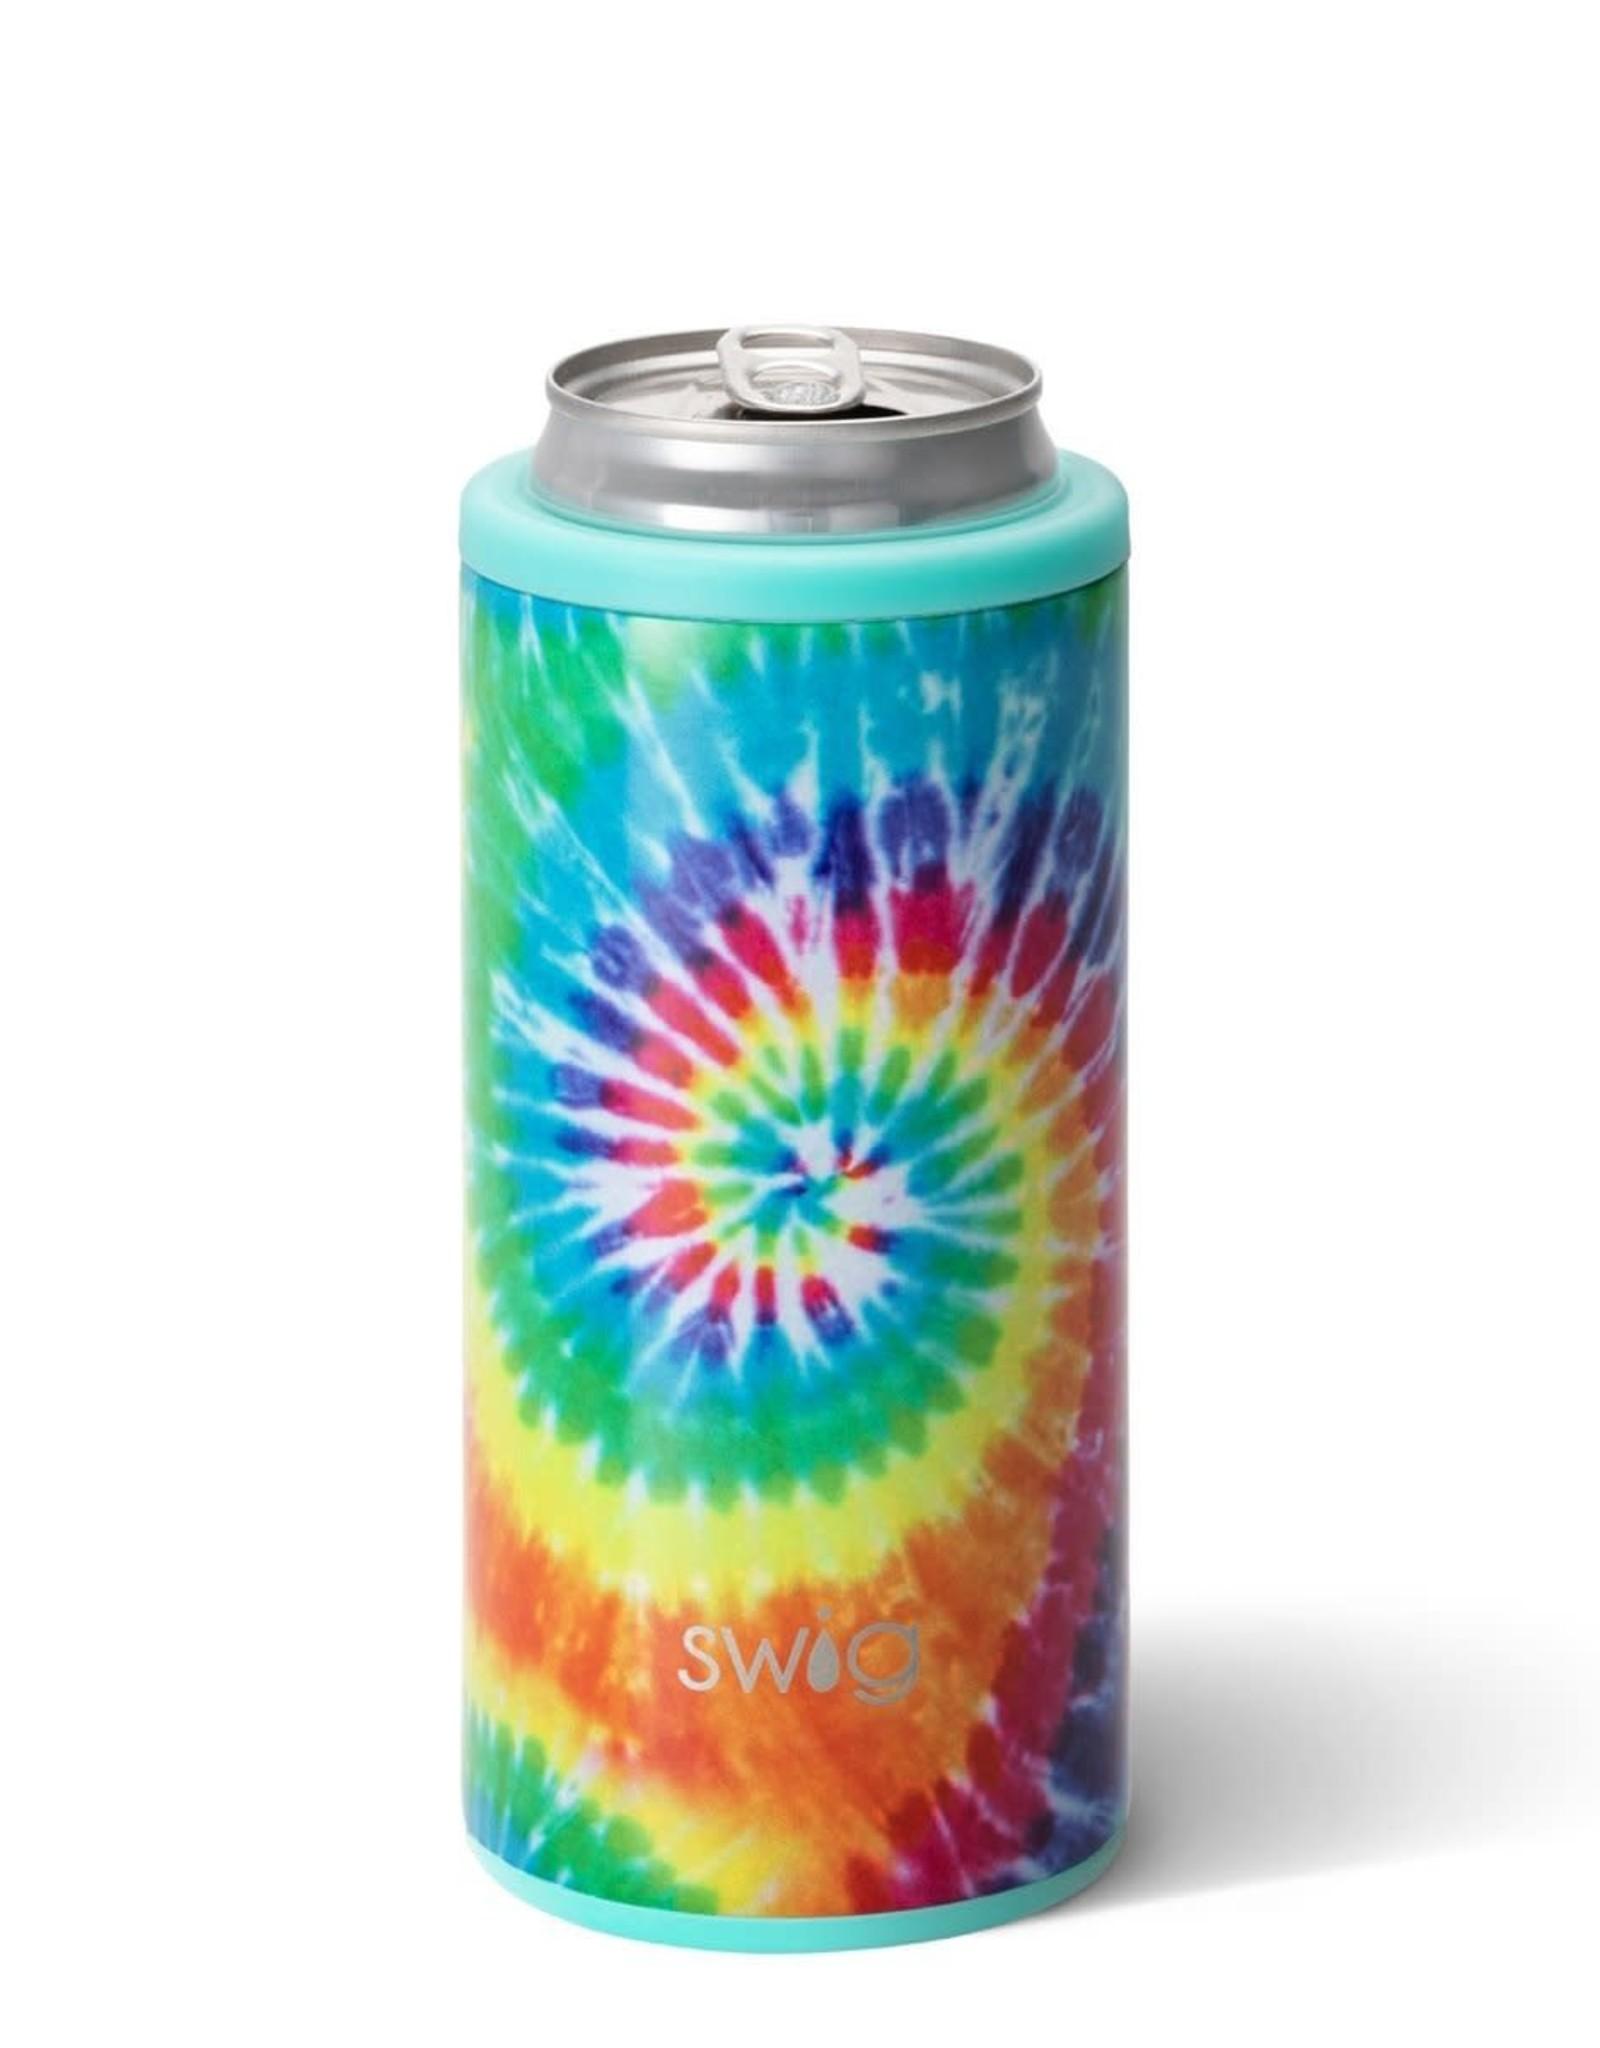 Swig Can Cooler - 12oz - Swirled Peace